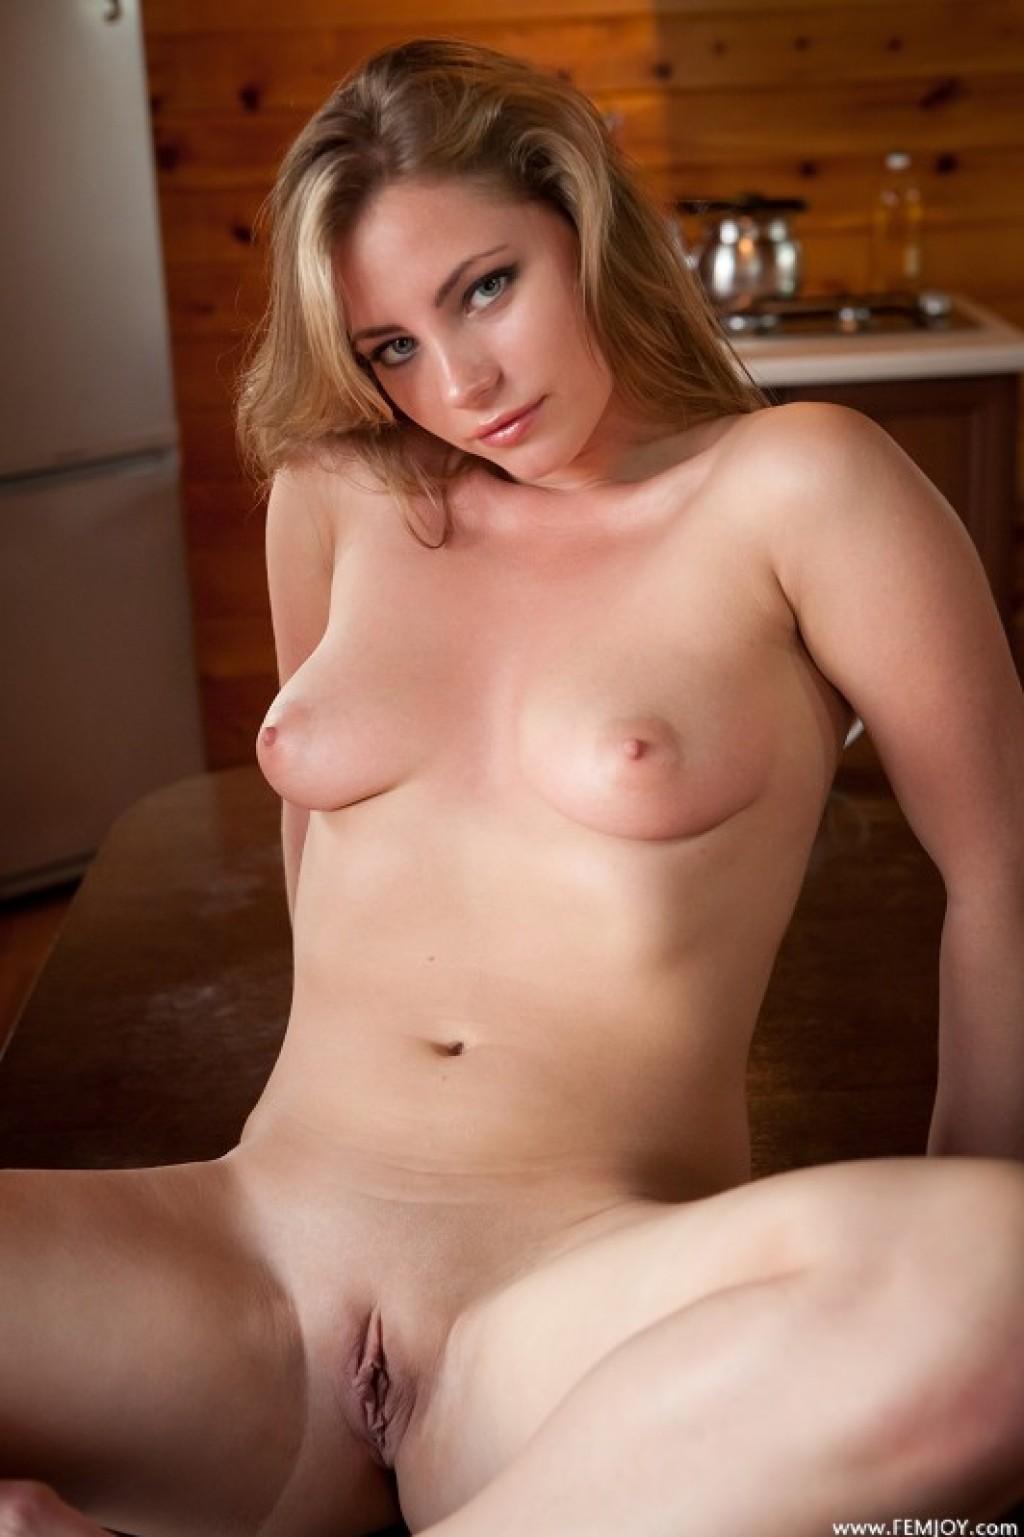 kolkata naked girls photos